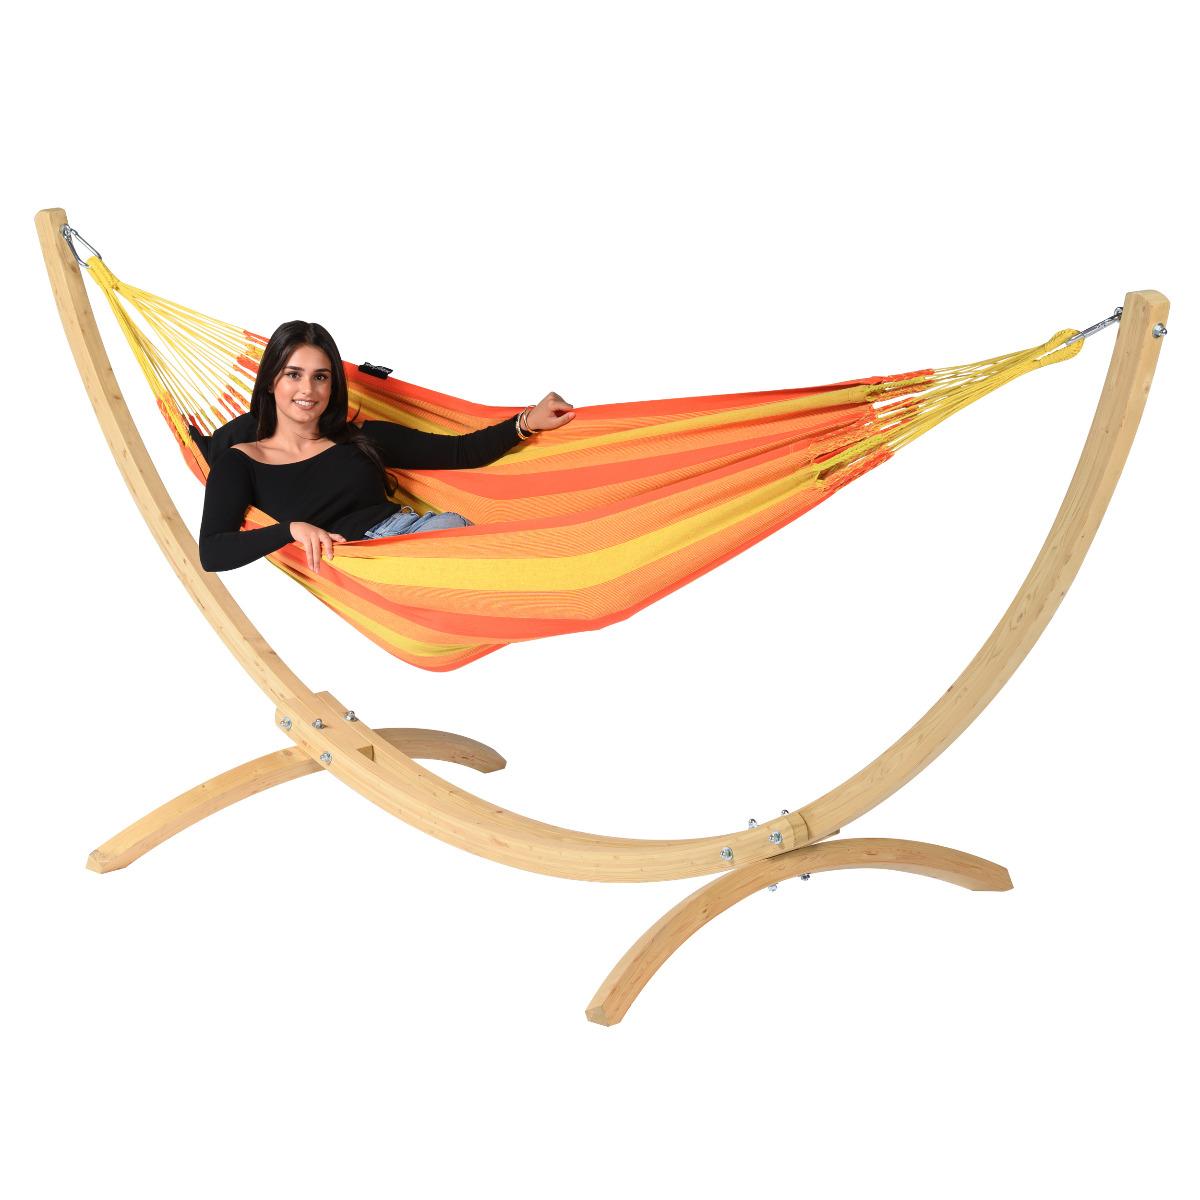 'Wood & Dream' Orange E�npersoons Hangmatset - Oranje - Tropilex �